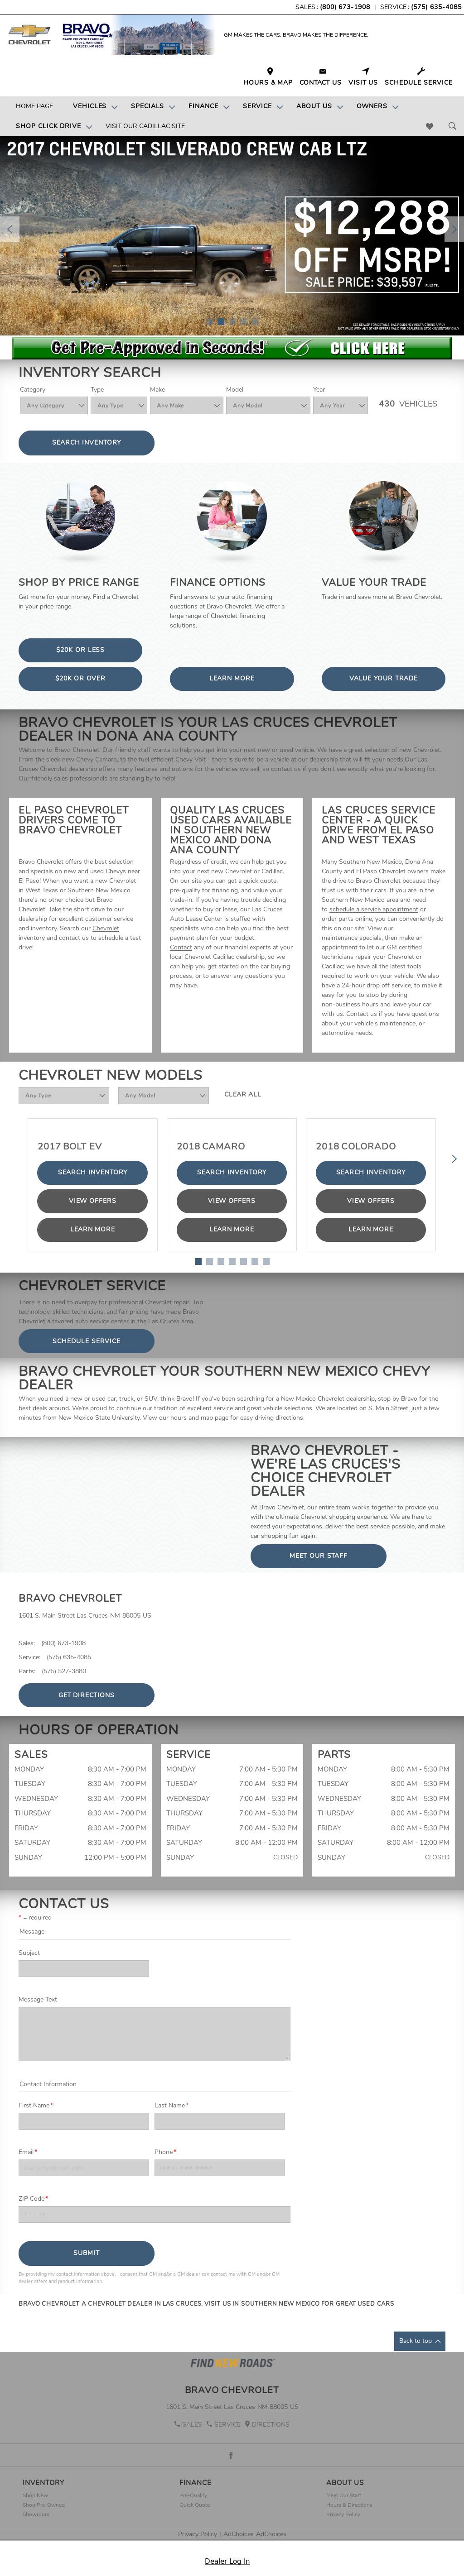 Bravo Chevrolet Cadillac Website History